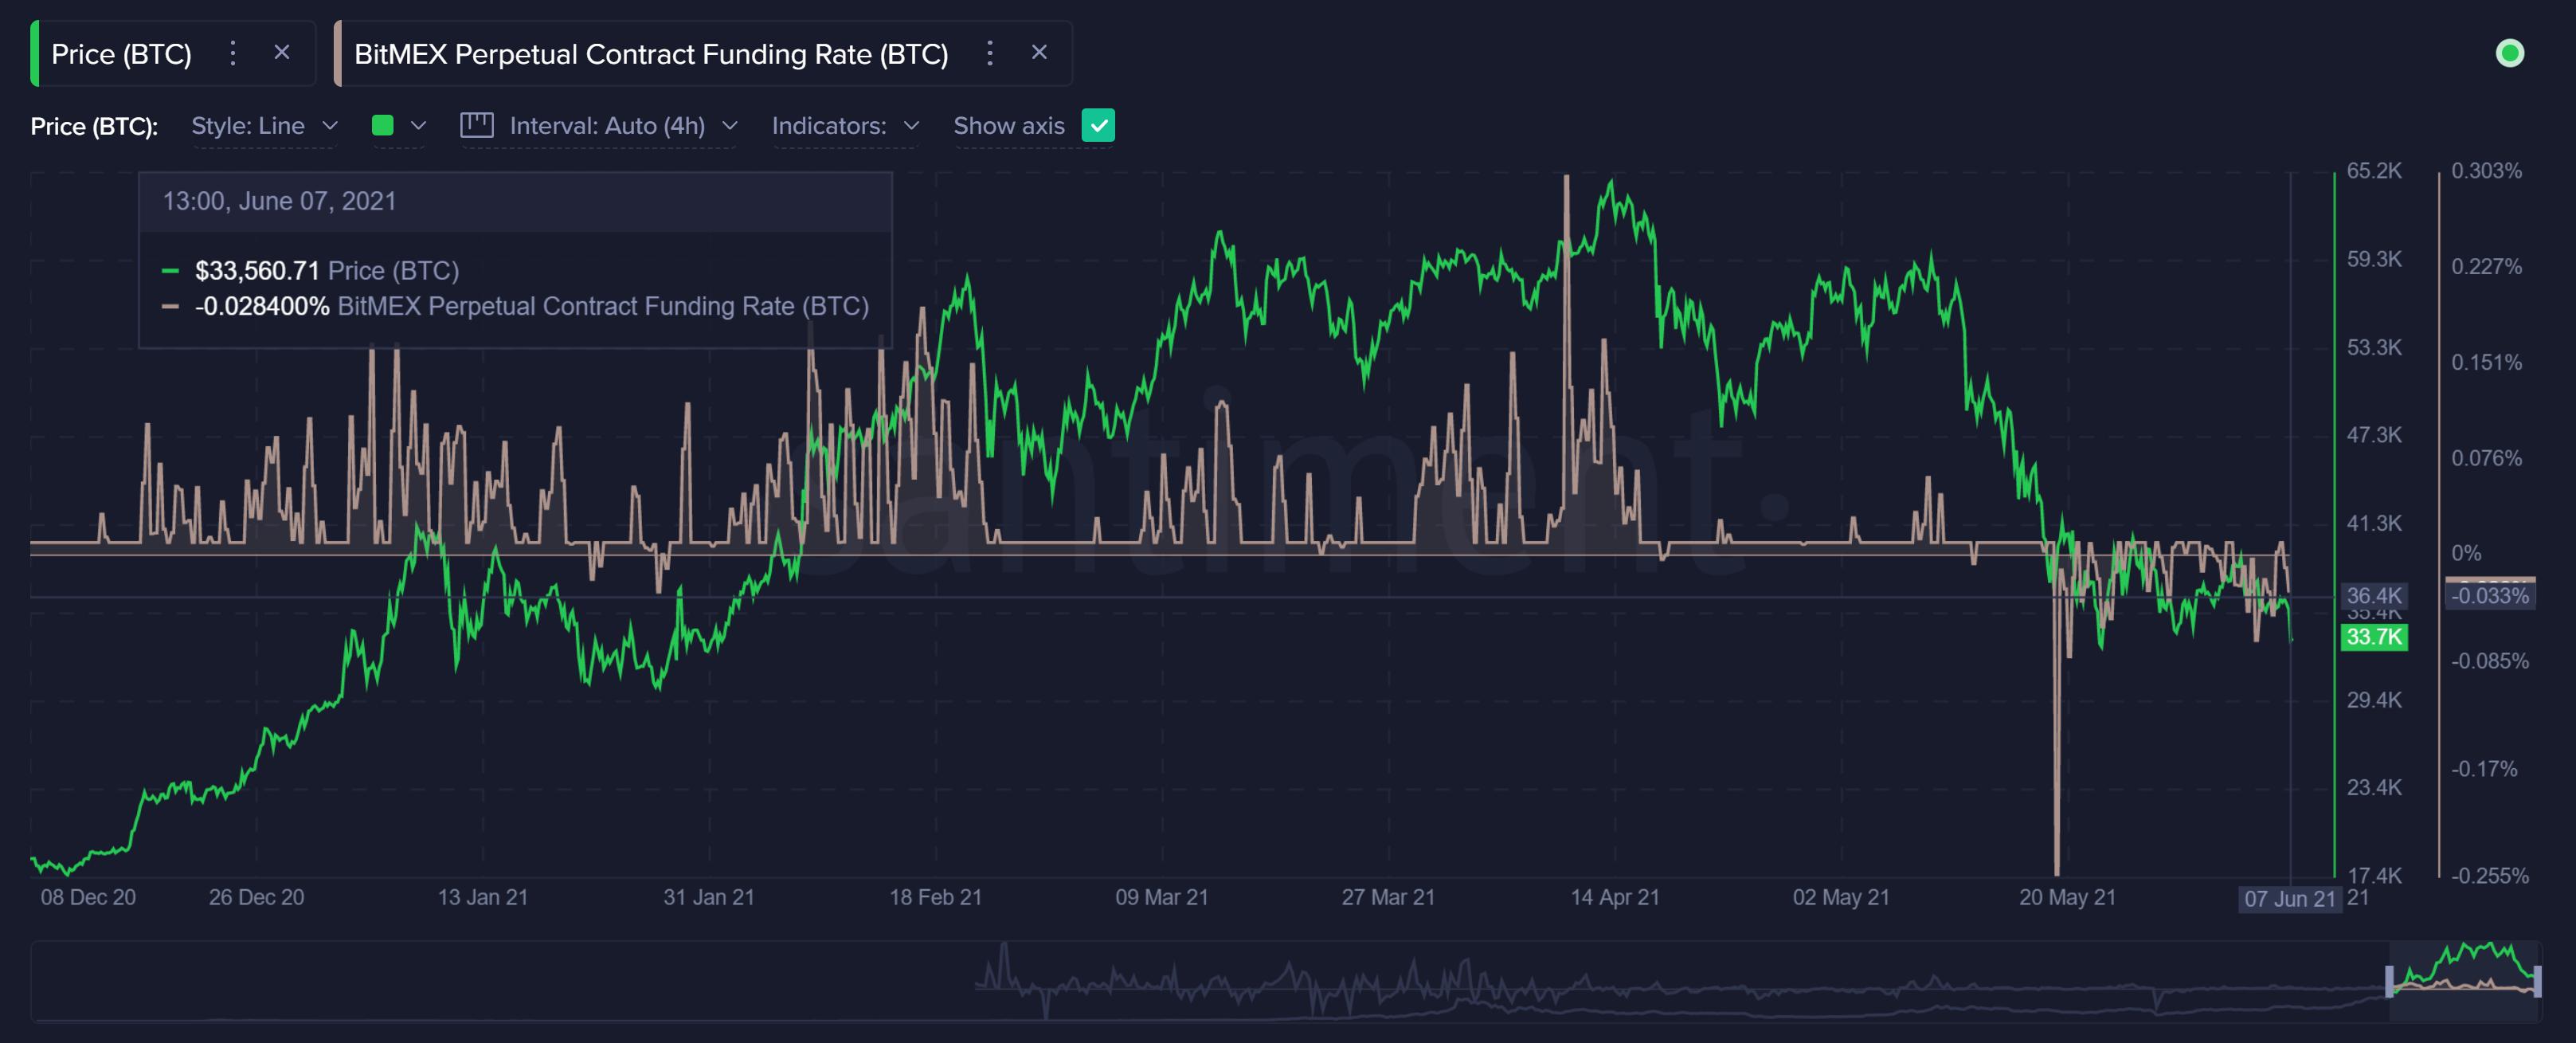 BTC Bitmex Perpetual Contract Funding Rate - Santiment